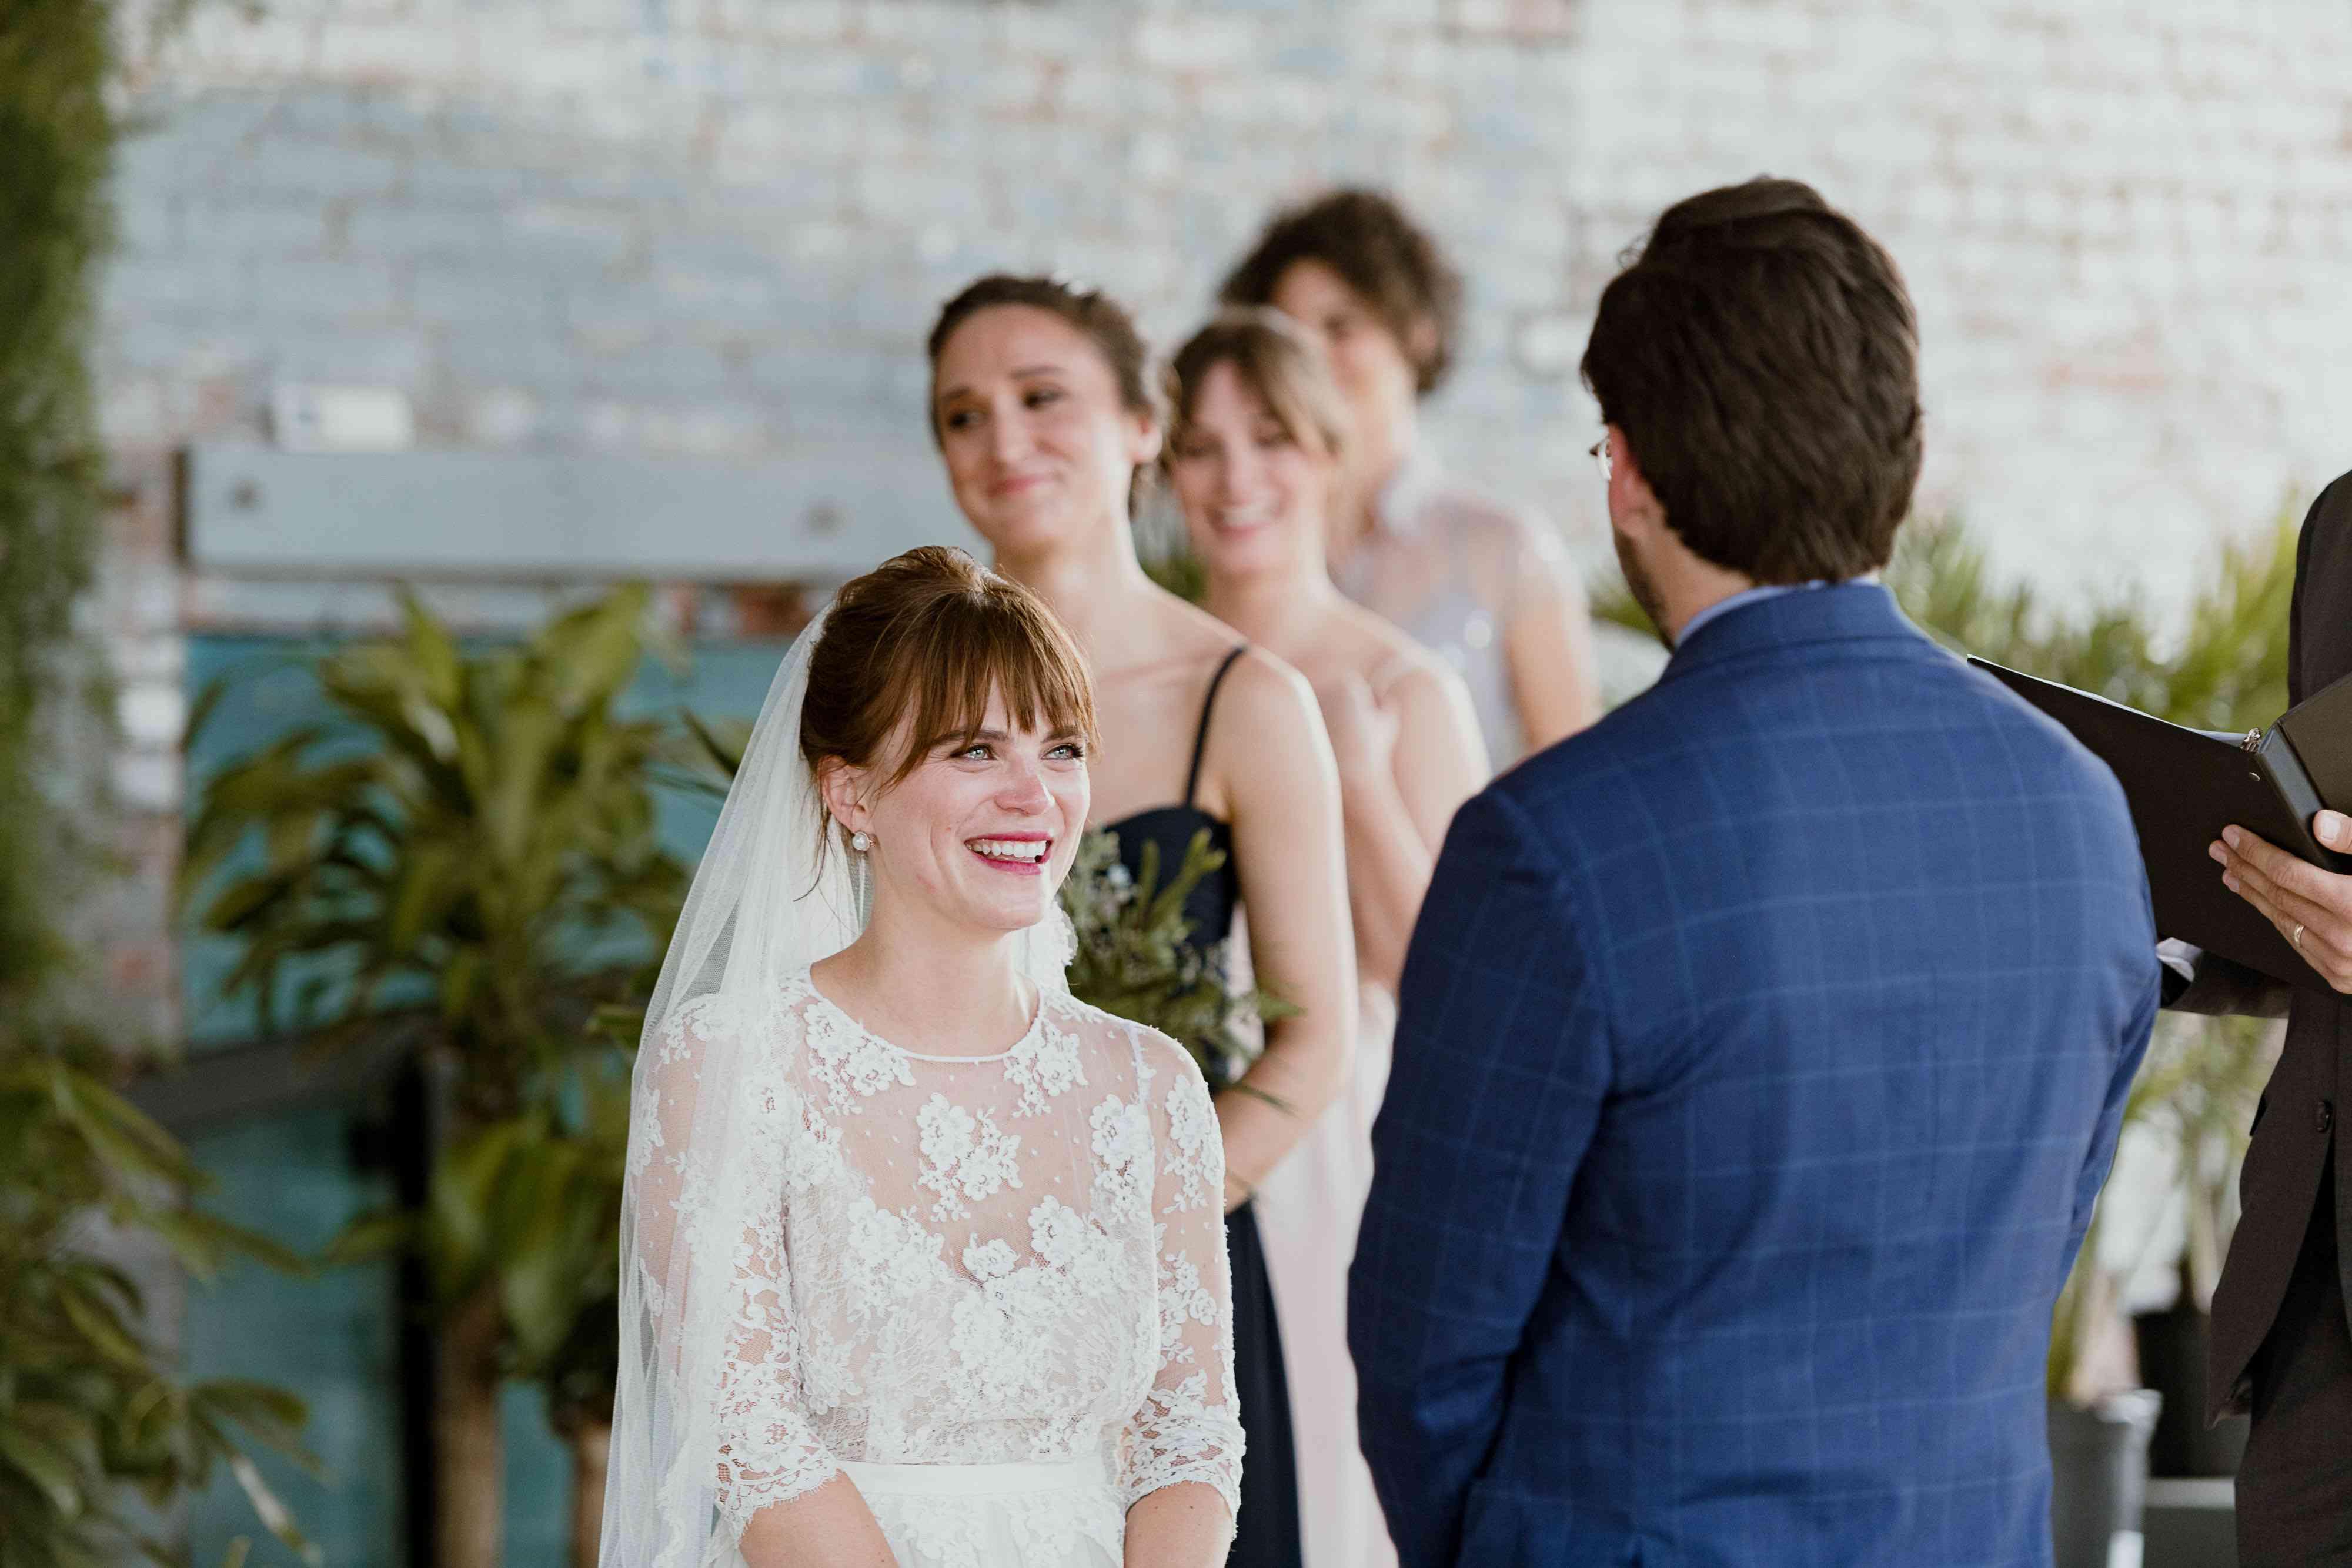 <p>ceremony bride smiling</p><br><br>